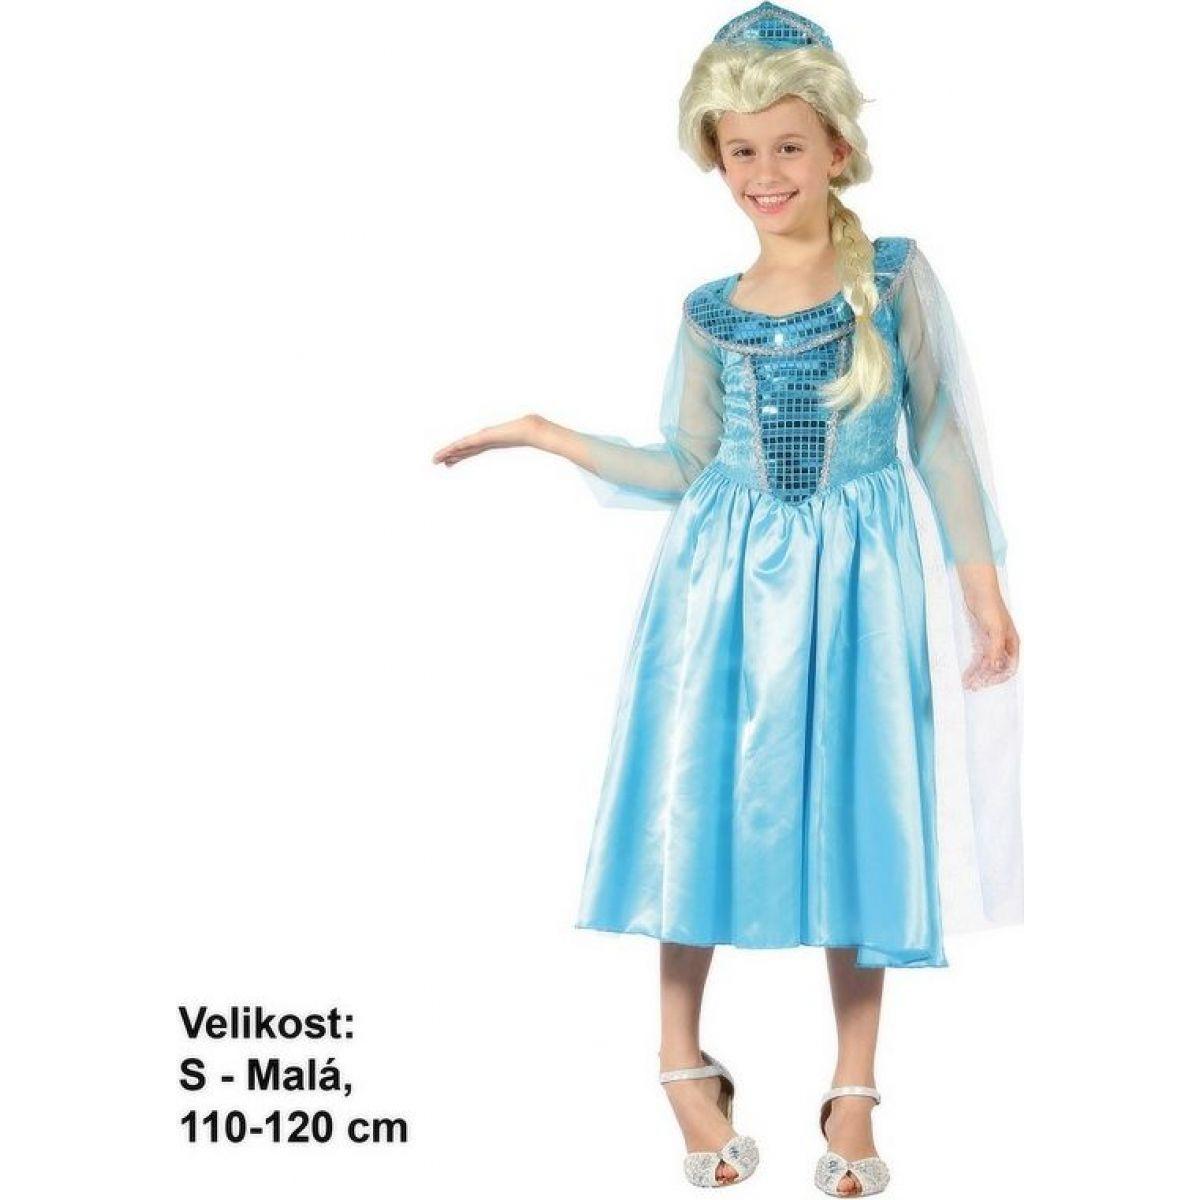 Dětský karnevalový kostým Ledová princezna 110 - 120 cm